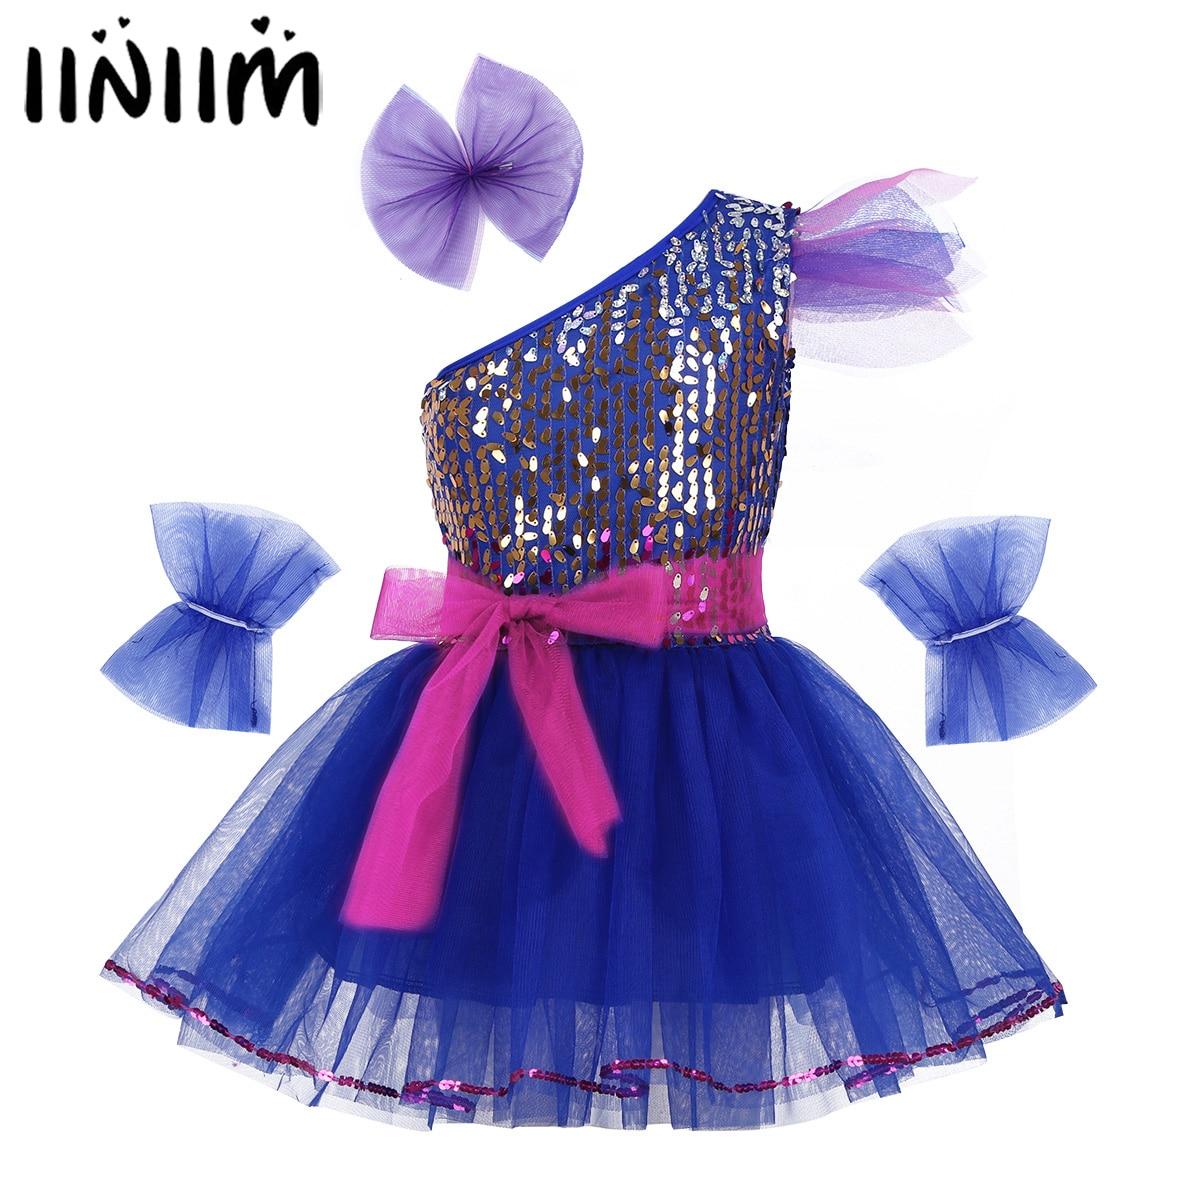 iiniim Kids Girls Leotard Dancewear Costume One-Shoulder Sparkly Sequins Mesh Dress with Hairclip Ballet Tutu Dance Dress